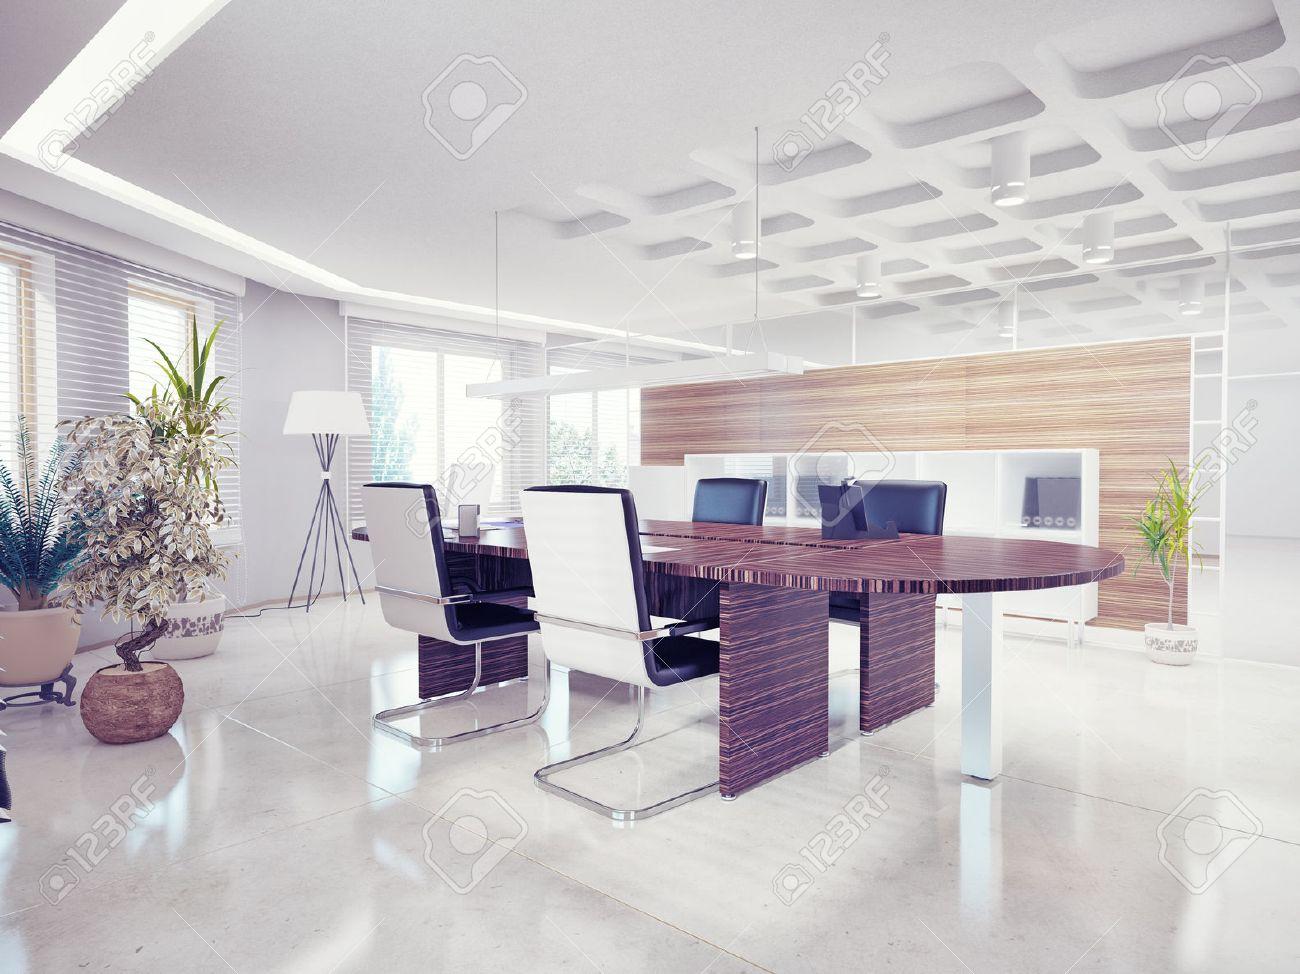 office interior design concepts. Modern Office Interior Design Concept Stock Photo - 26191528 Concepts E